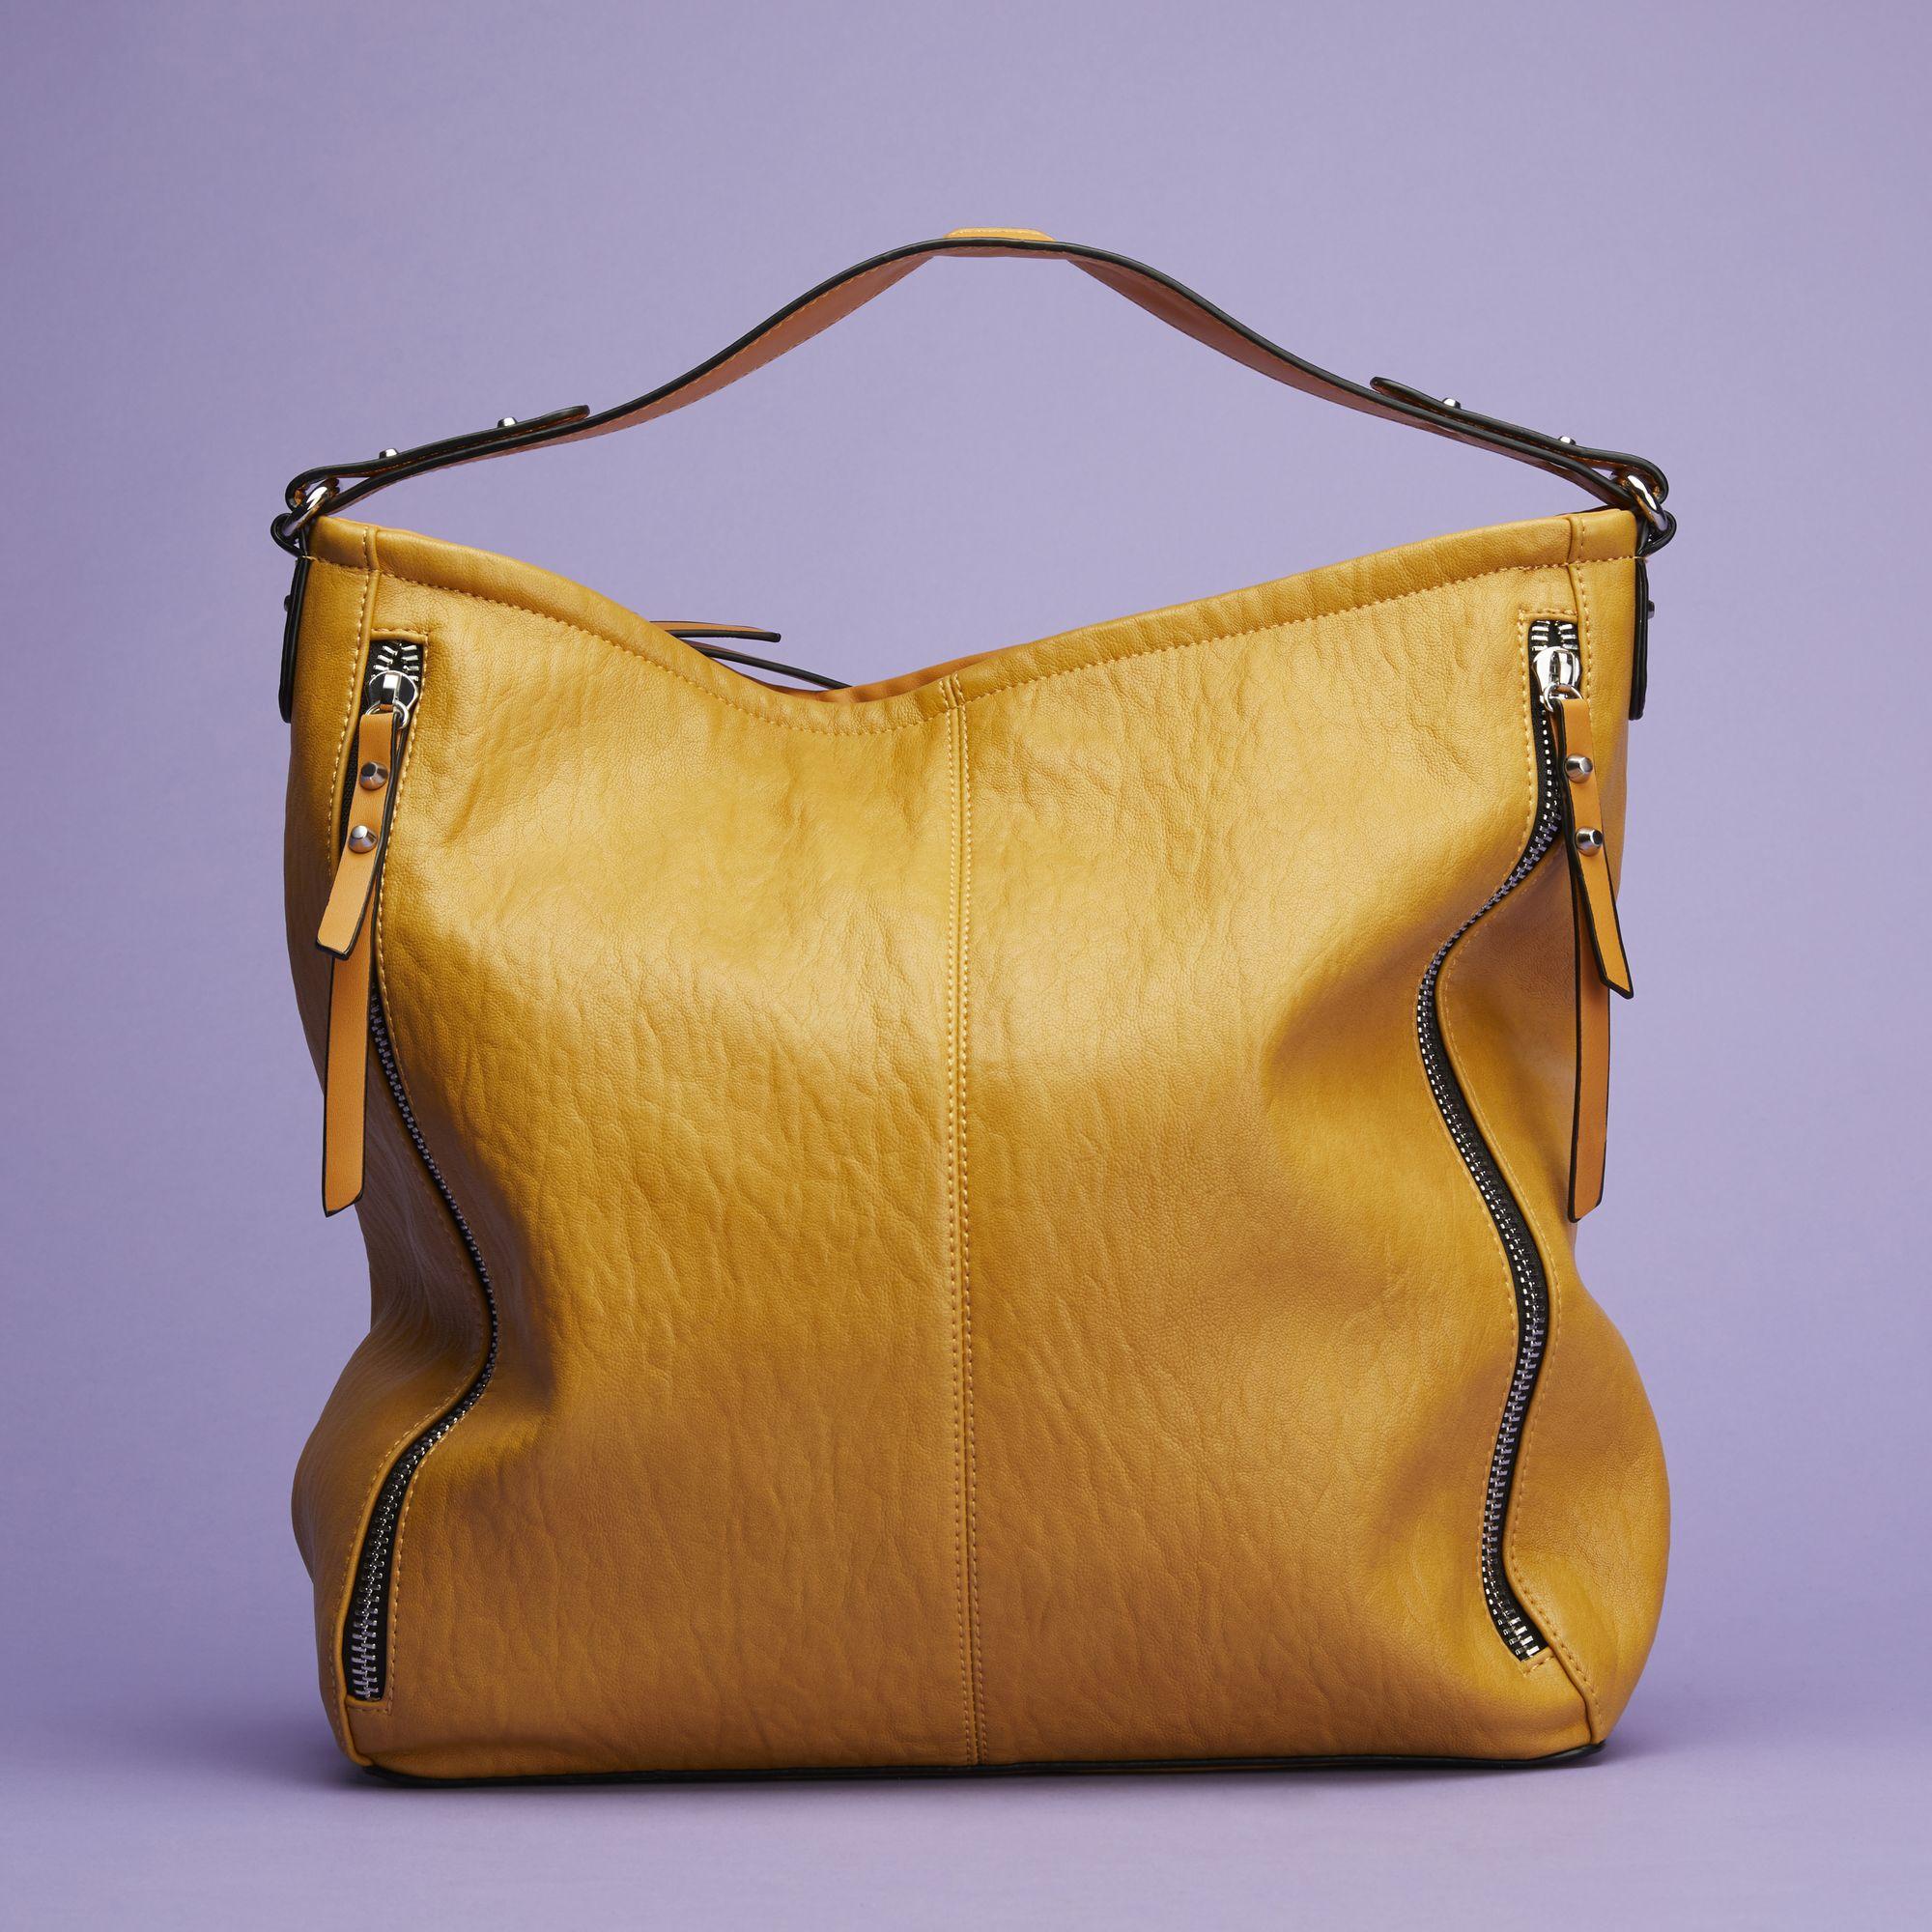 Don Donna Camille Shoulderbag handväska, Mörkgul